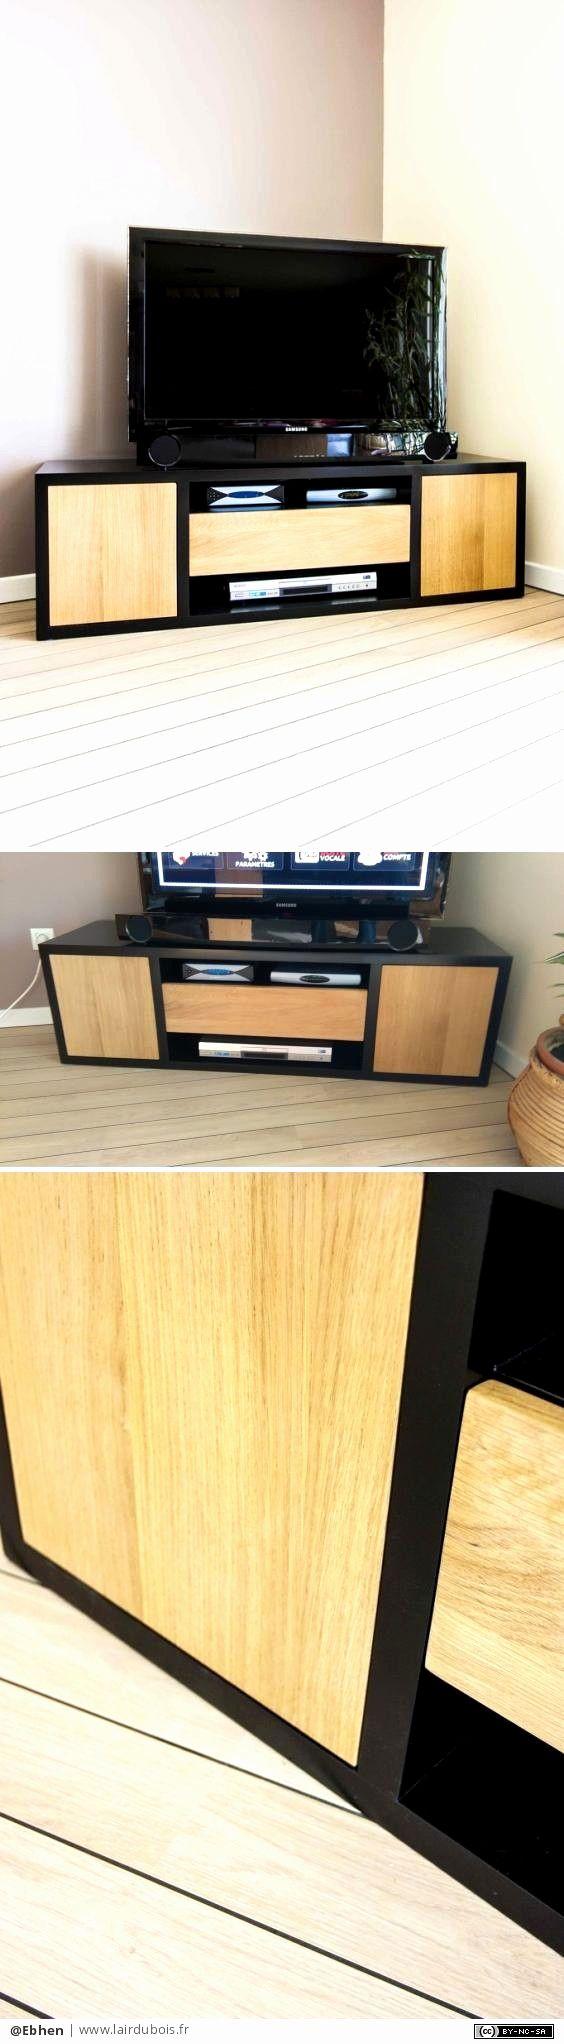 Interior Design Alinea Meuble Tv Meuble Industriel Elegant Banc Tv Alinea Maison Design Interieur Et Meu Transforming Furniture Cool Furniture Living Furniture